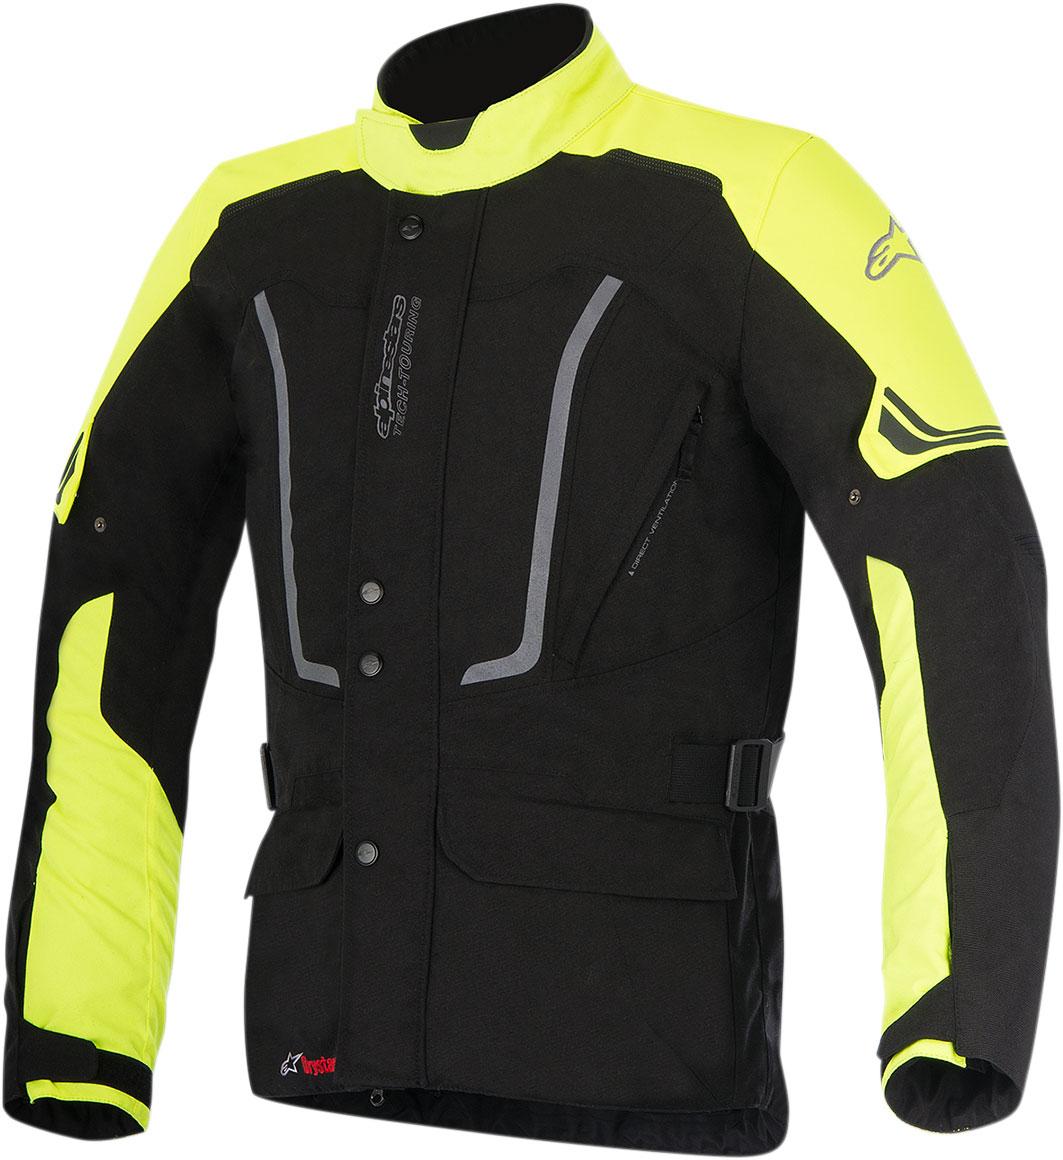 Alpinestars VENCE Drystar Adventure-Touring Jacket (Black/Flo Yellow)